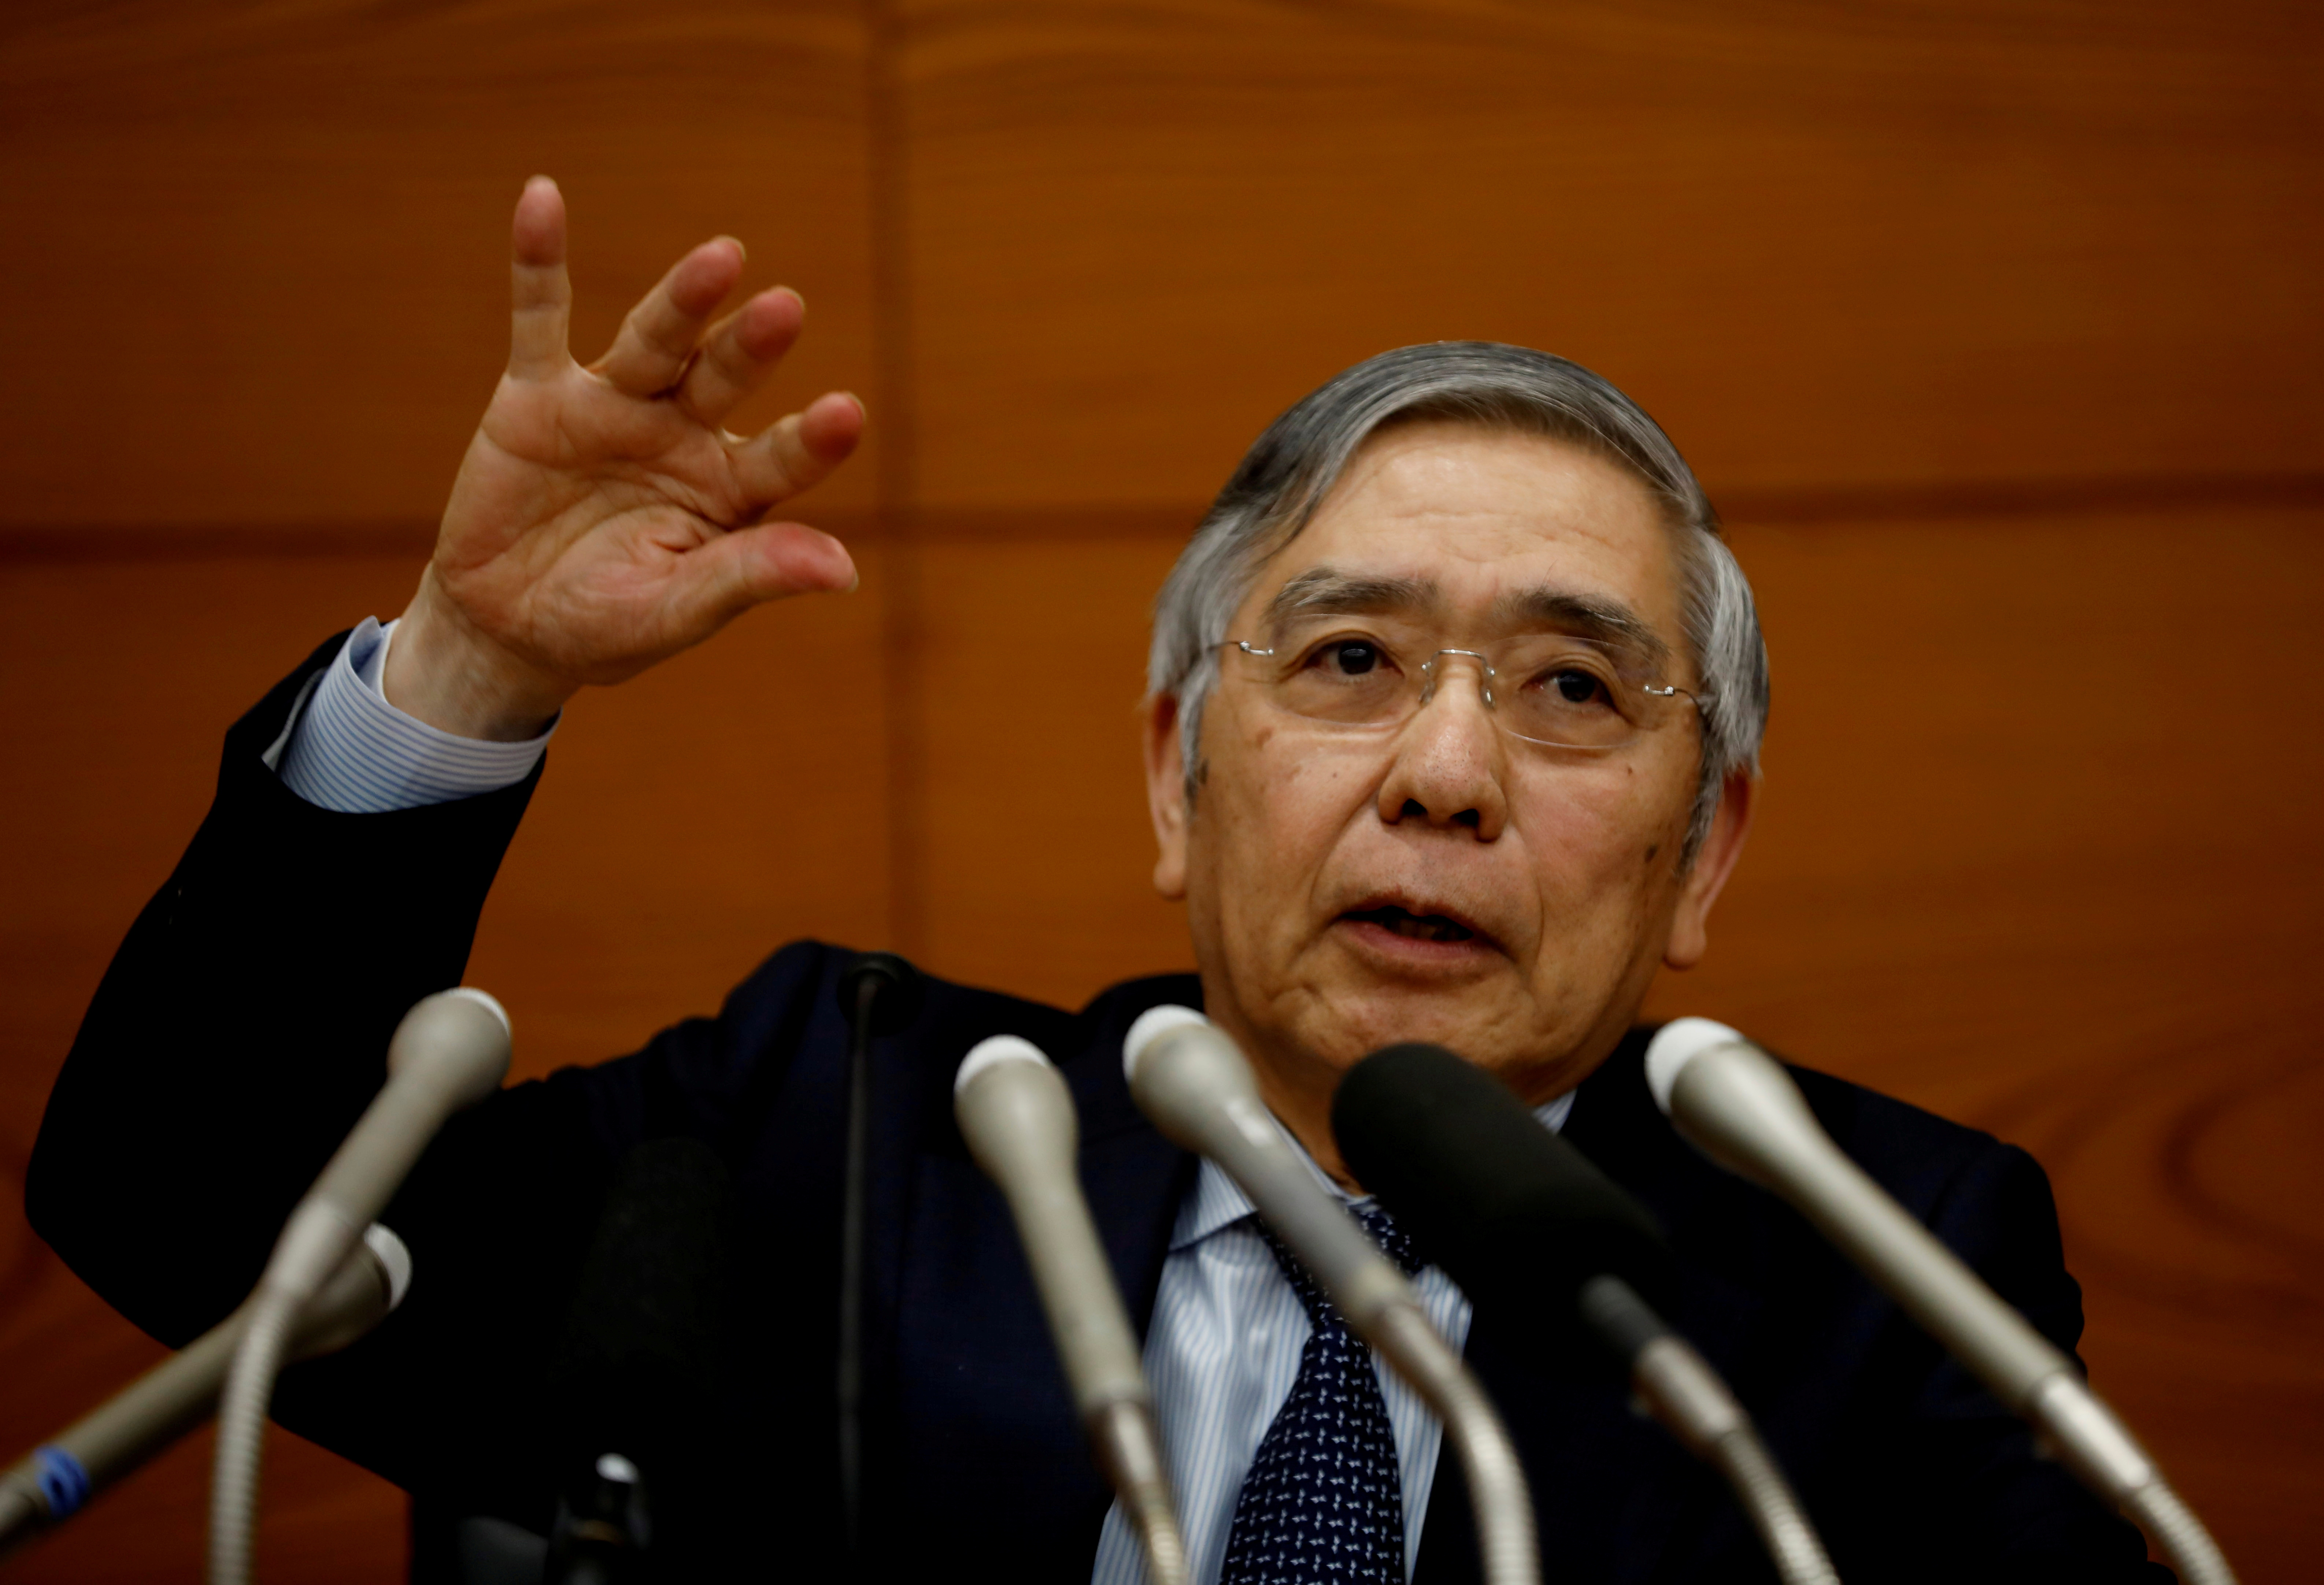 Bank of Japan Governor Haruhiko Kuroda speaks at a news conference in Tokyo, Japan, December 19, 2019. REUTERS/Kim Kyung-Hoon